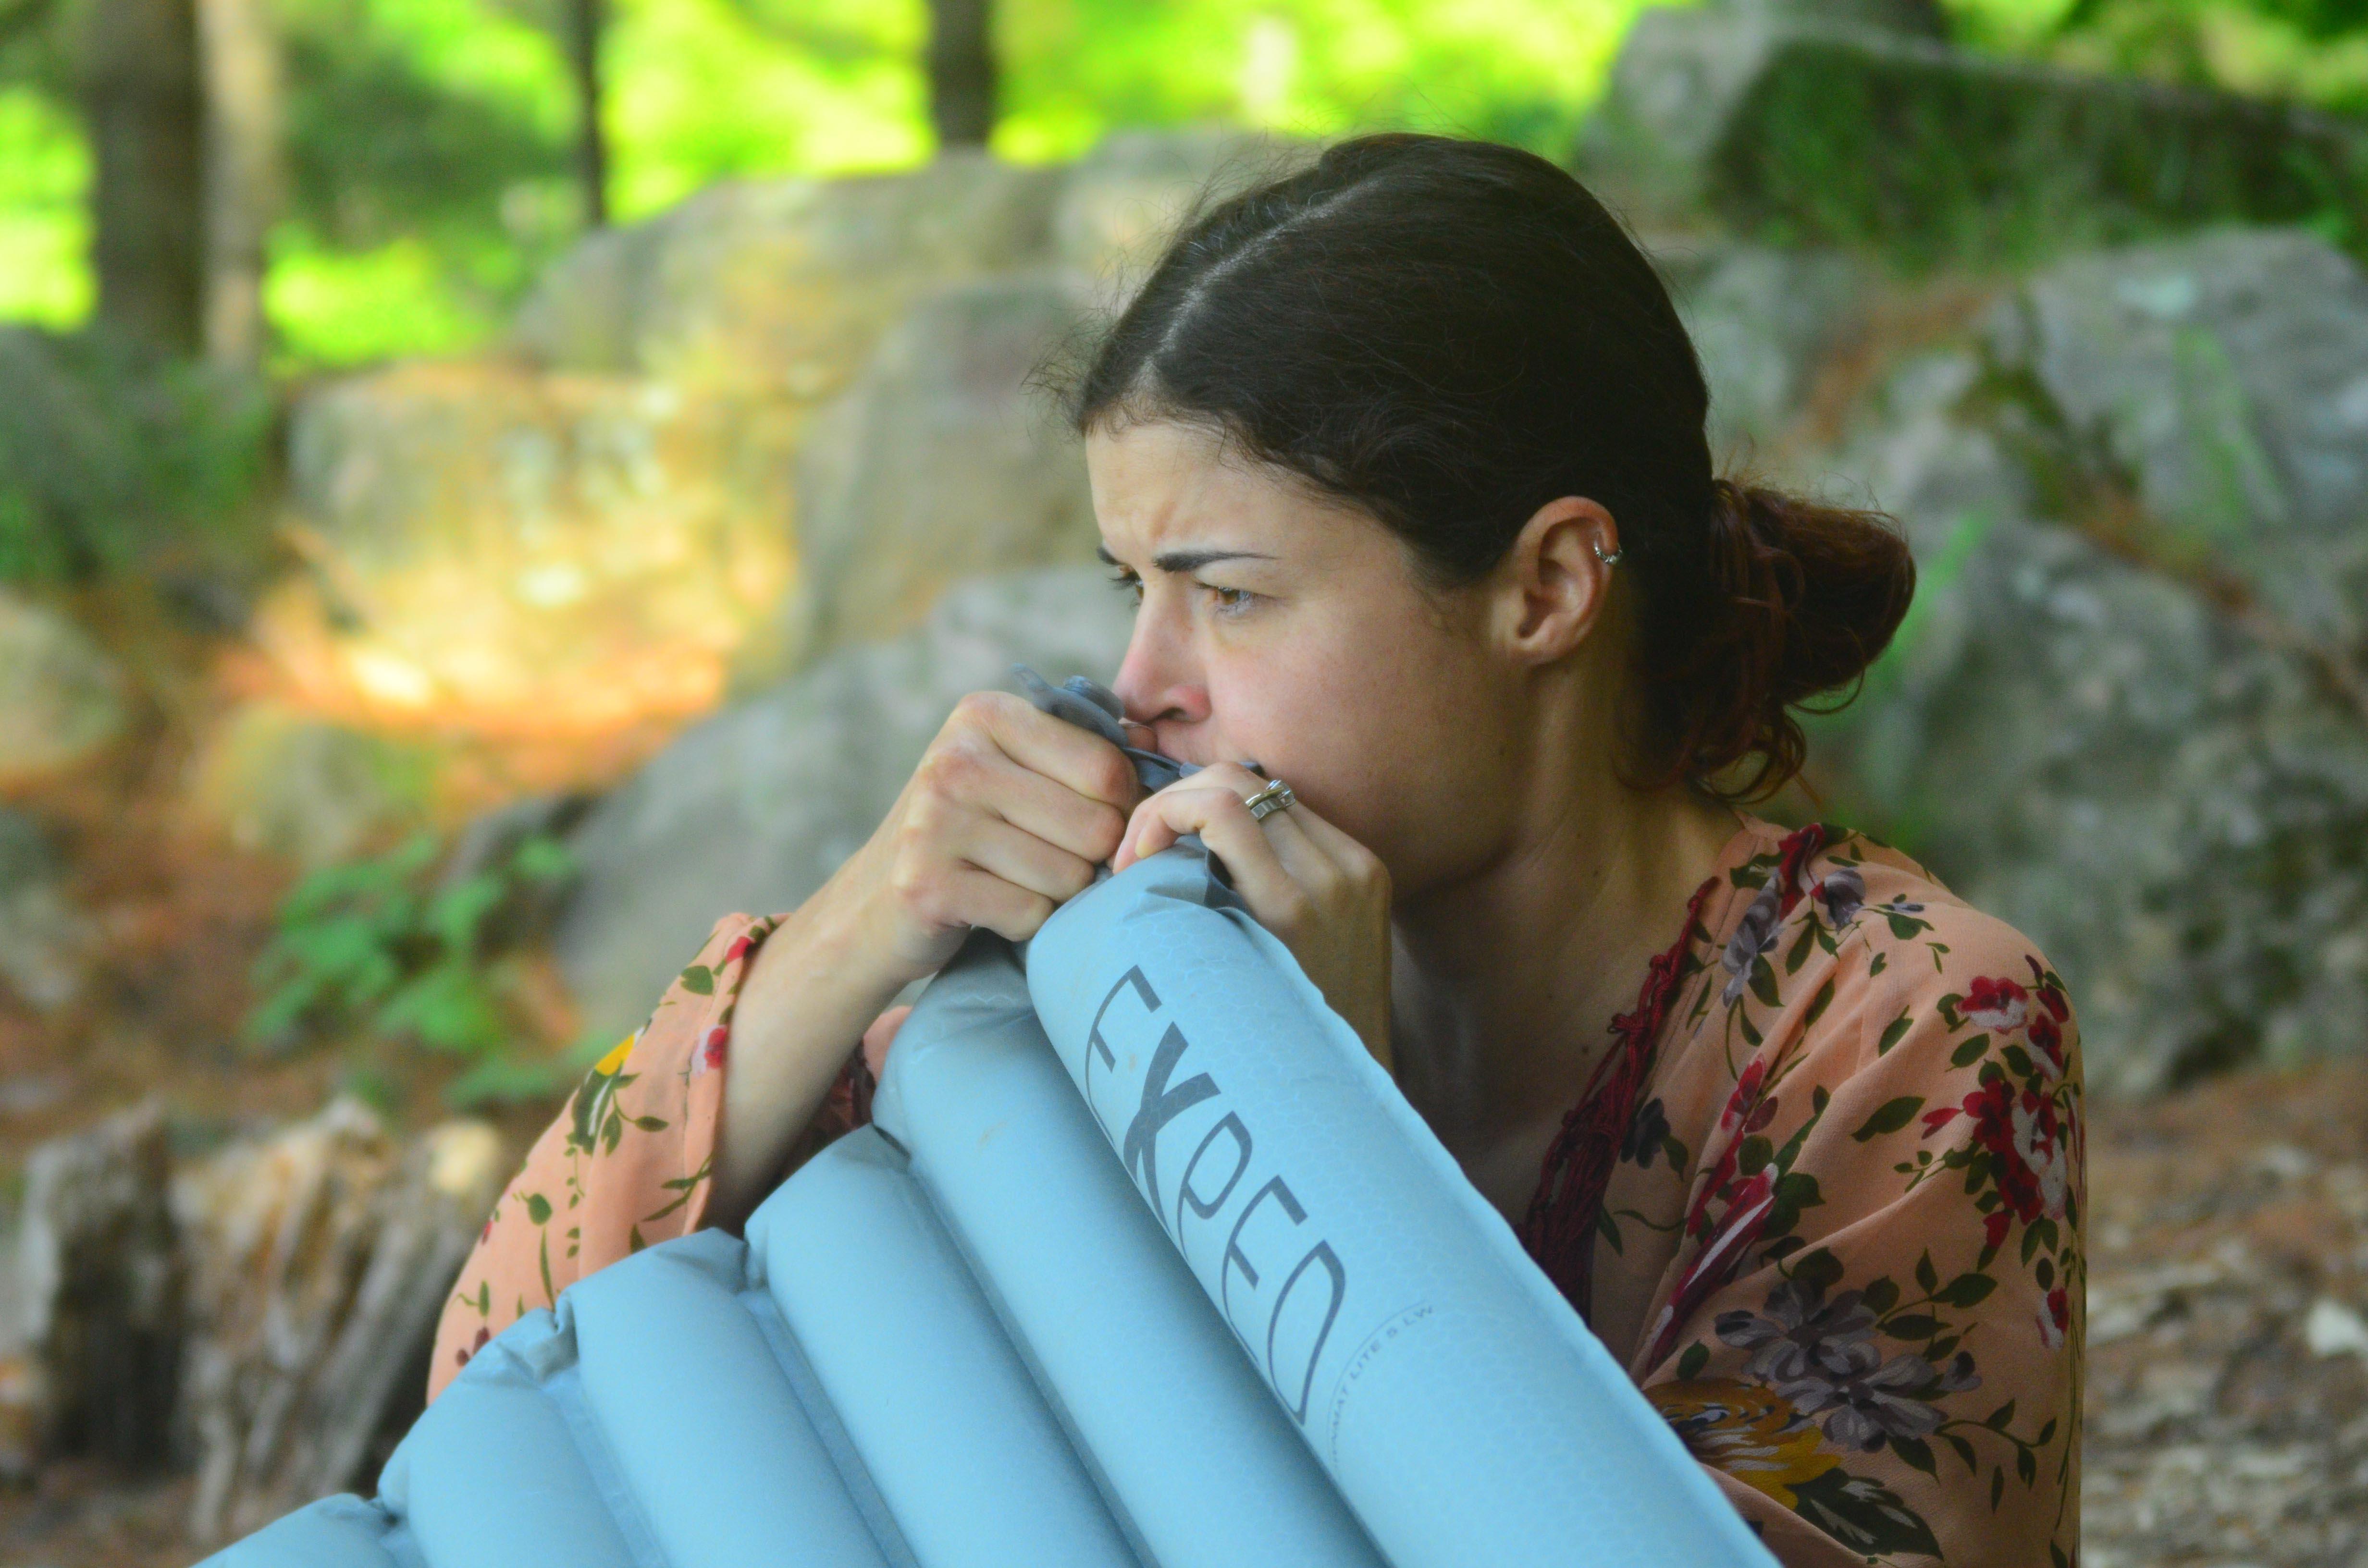 Greengearapalooza Camping Gear Review Sleeping Arrangements